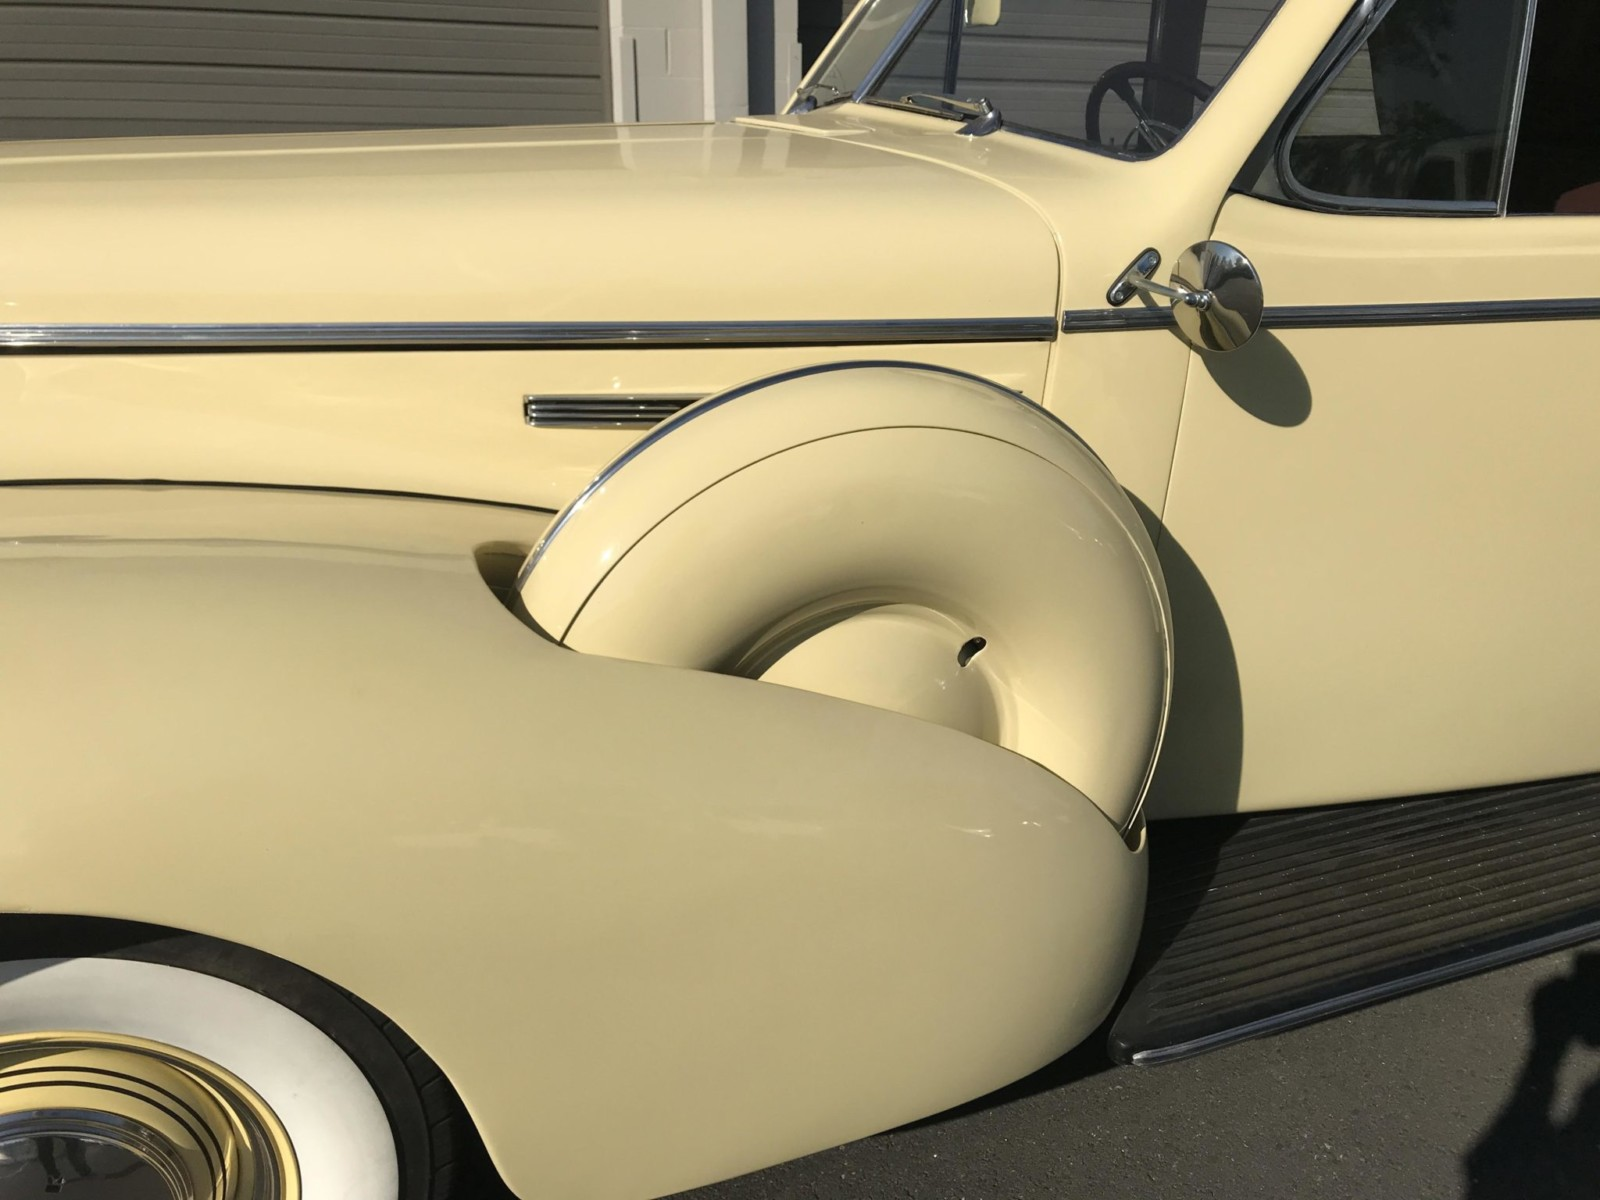 1939 Buick Roadmaster Phaeton Convertible 81-C 11